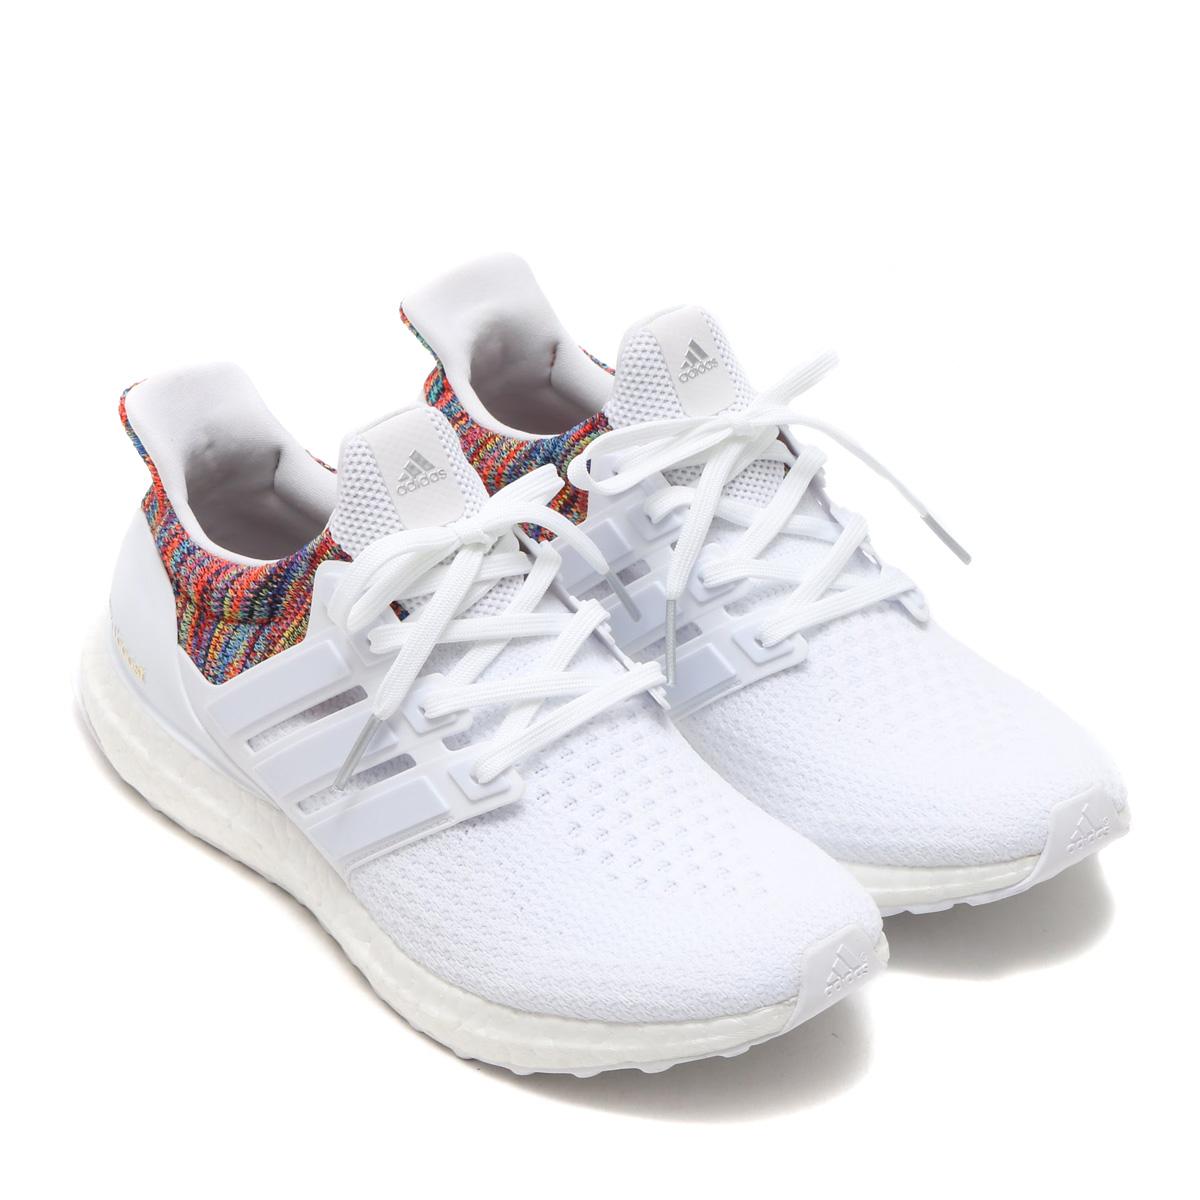 ece2db843 adidas Originals mi Ultra Boost (Adidas originals Mai ultra boost) White Aero  Red Aero Red 18SS-S